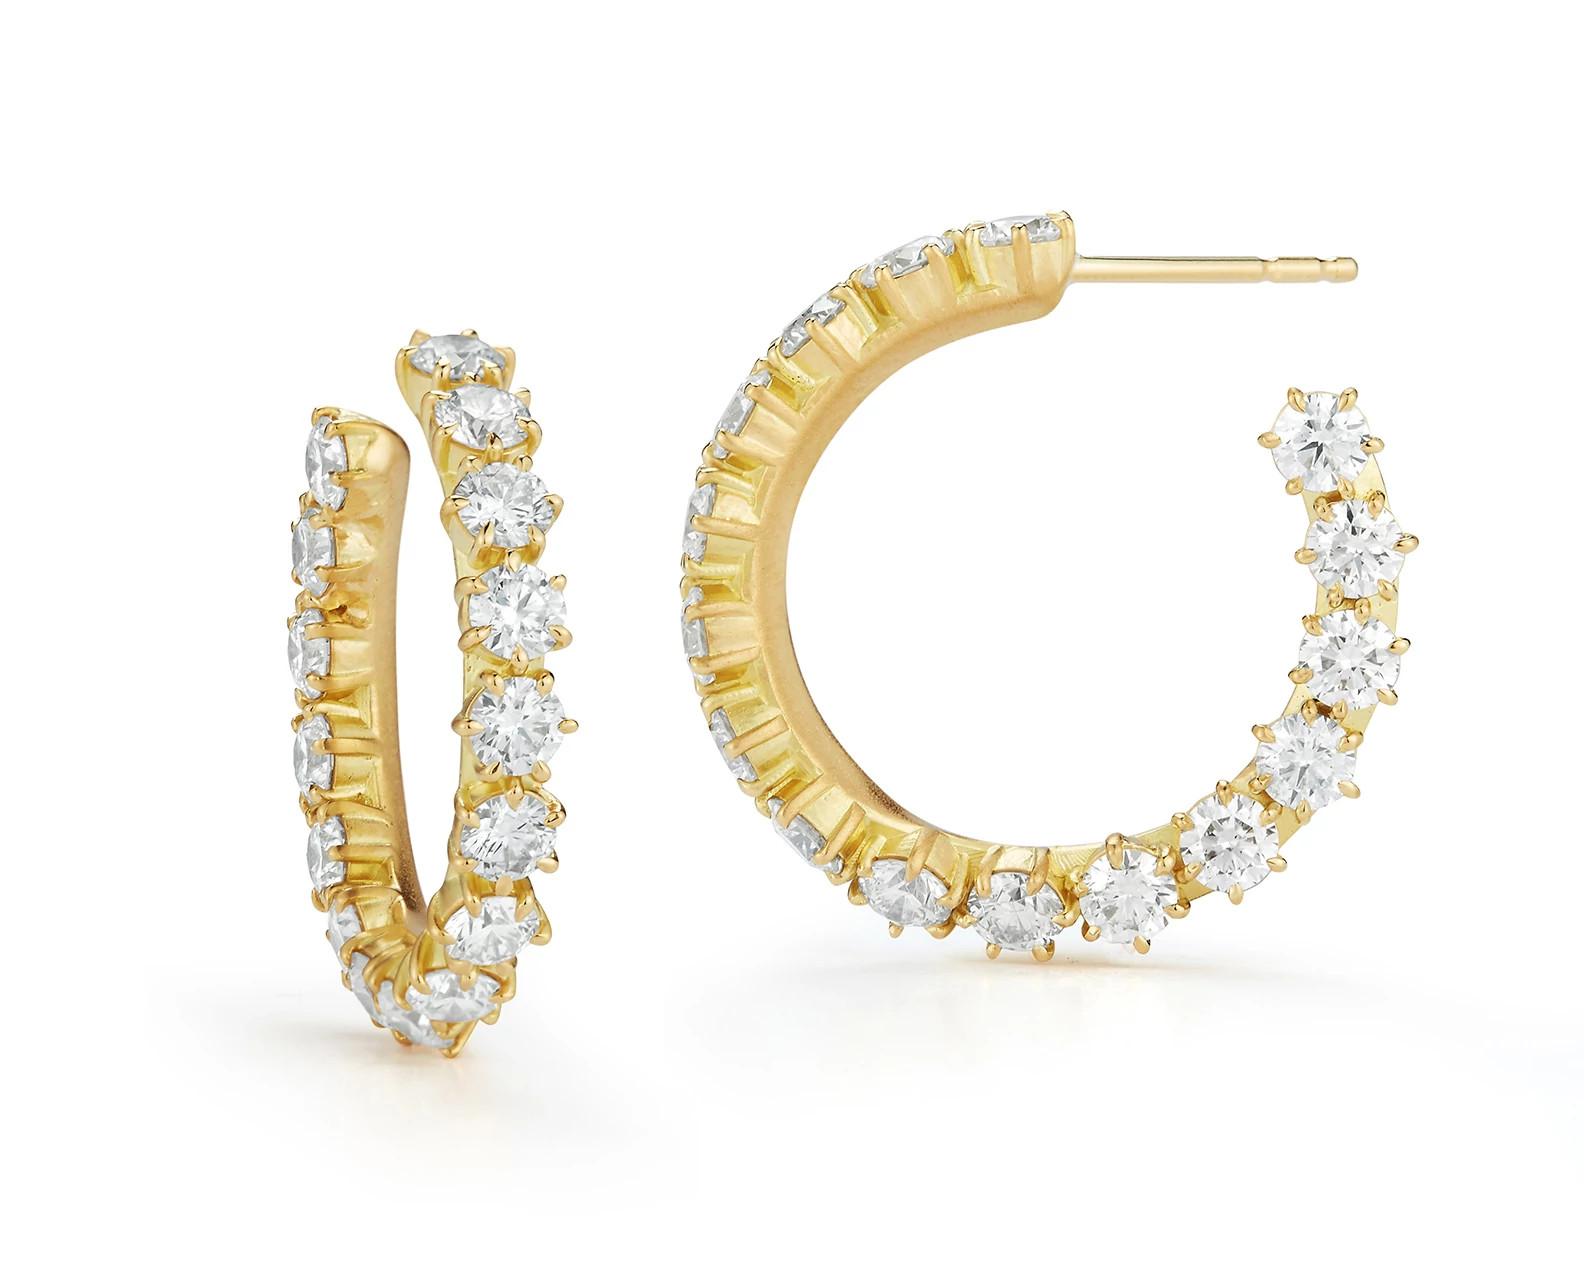 Jade Trau Catherine系列18K金镶天然钻石耳环